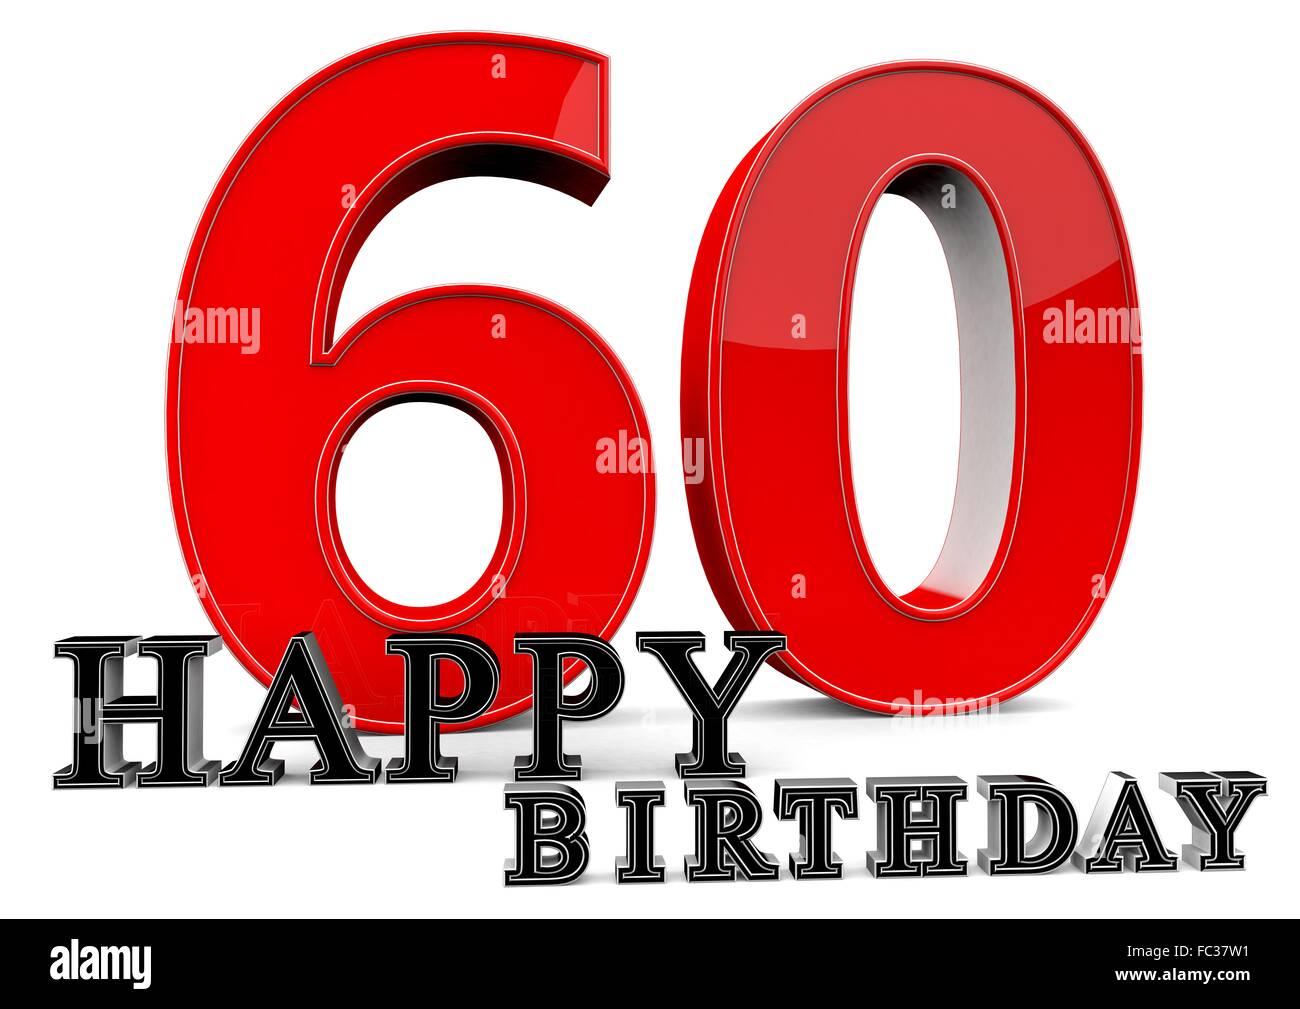 happy birthday zum 60 geburtstag stock photo 93499757. Black Bedroom Furniture Sets. Home Design Ideas